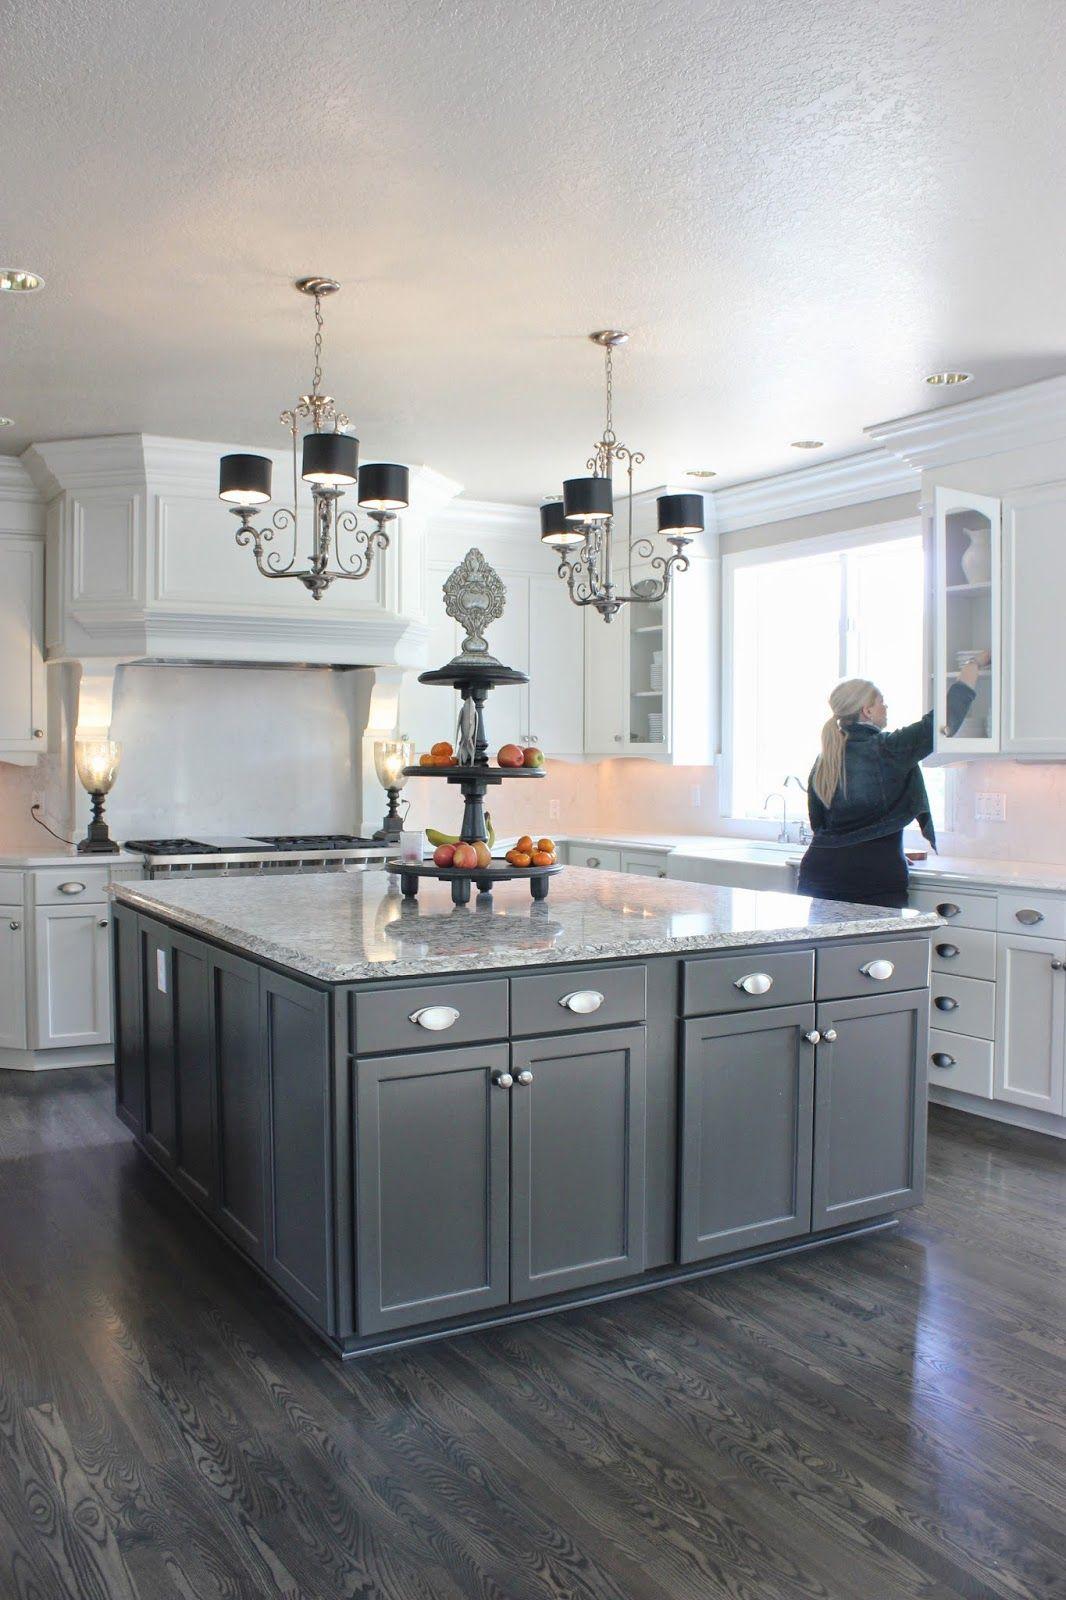 staining hardwood floors gray kitchen design home kitchens kitchen cabinet design on kitchen cabinets grey and white id=39598